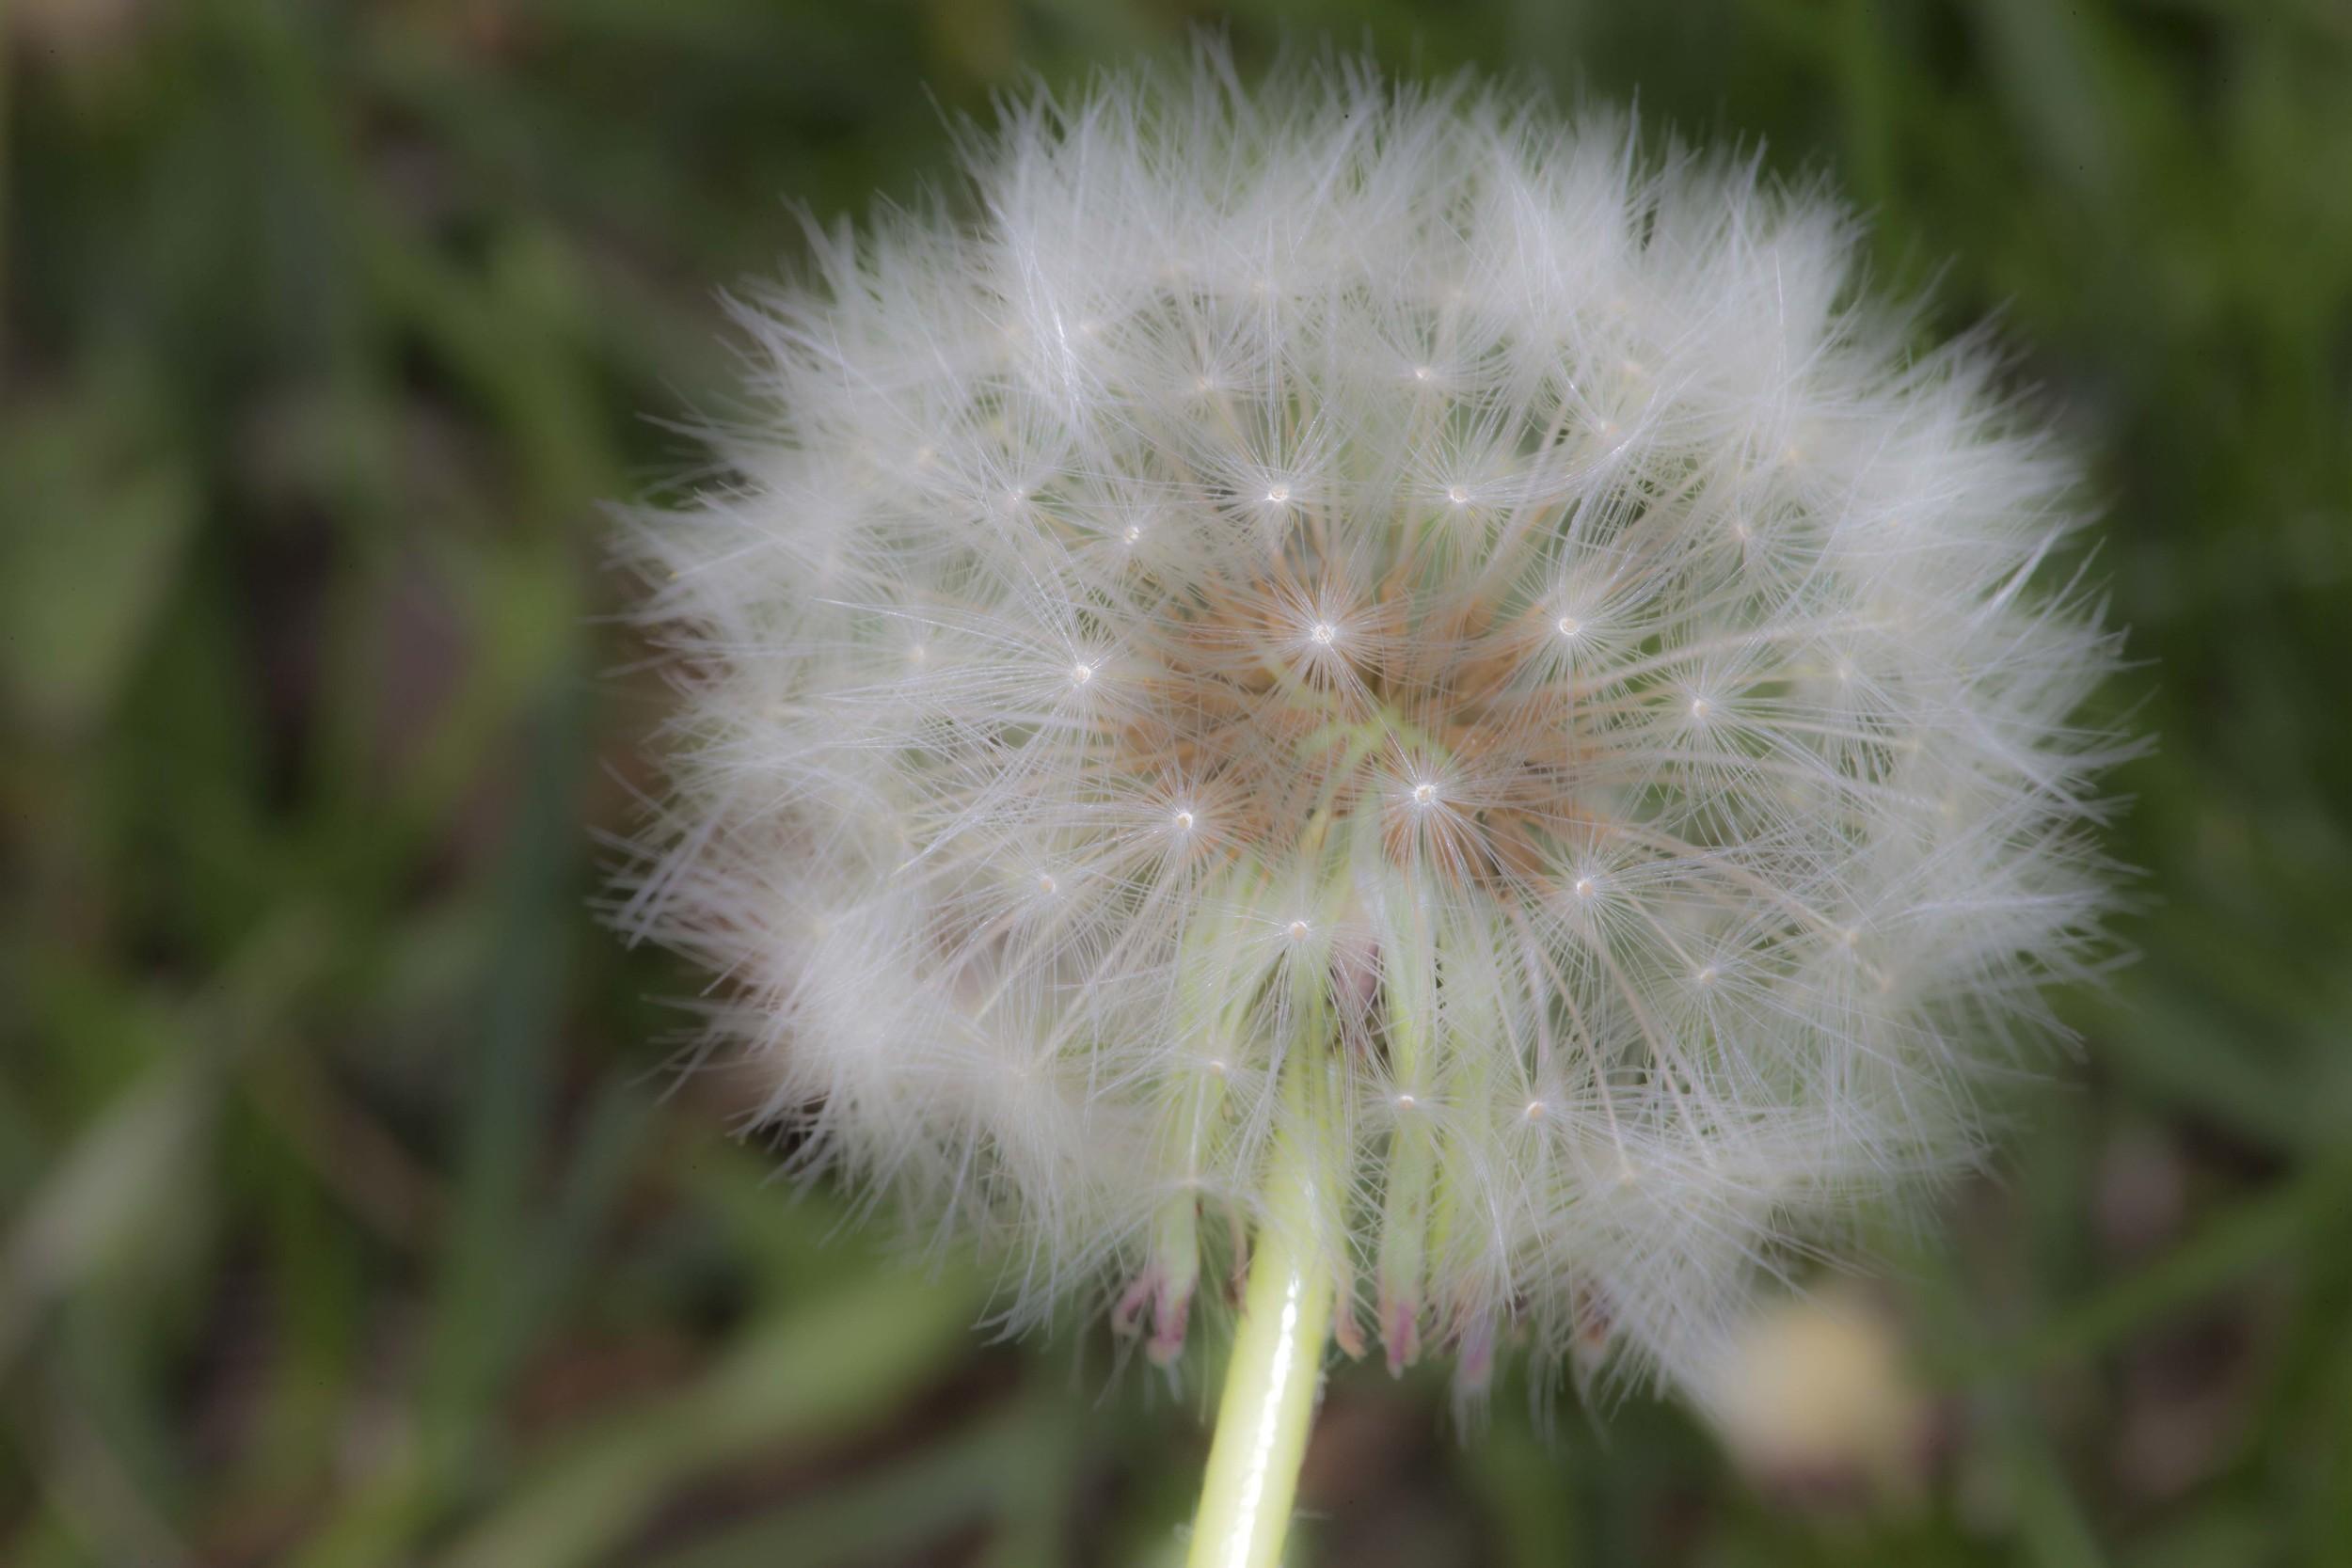 Dandelion 1182